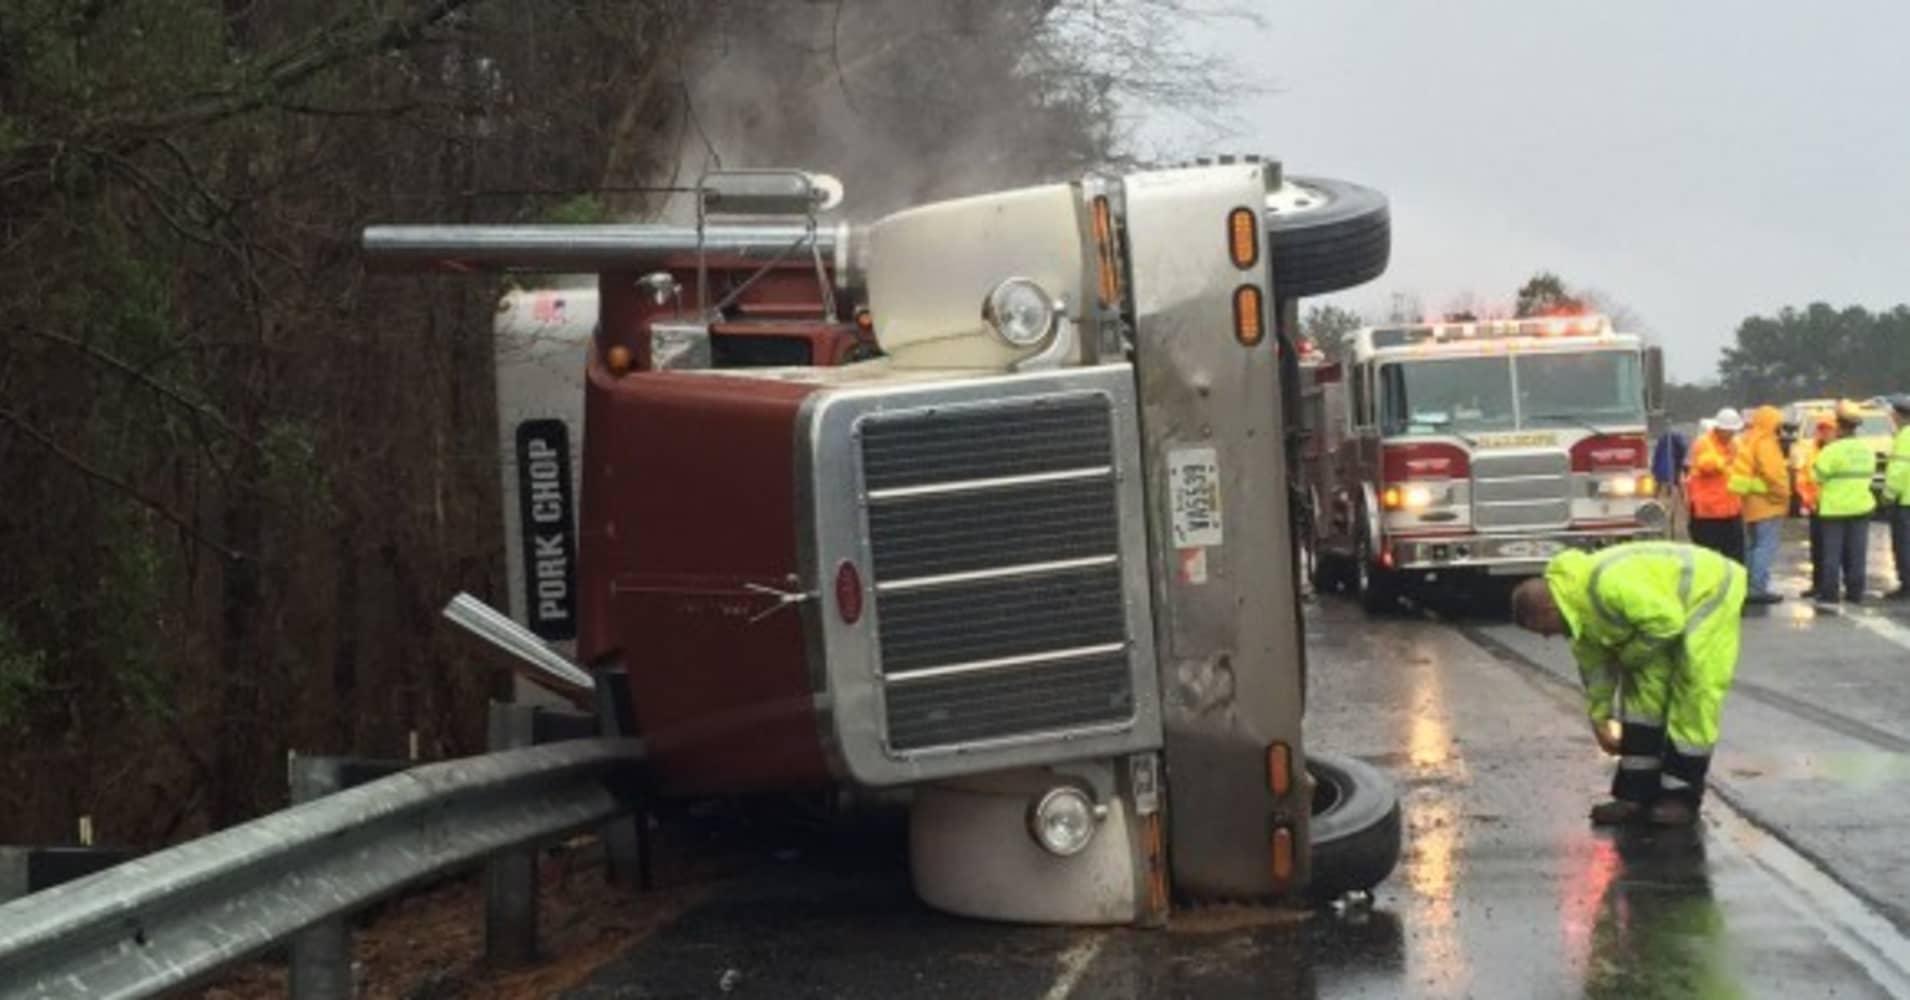 Truck falls on I-40, spills 2,600 piglets